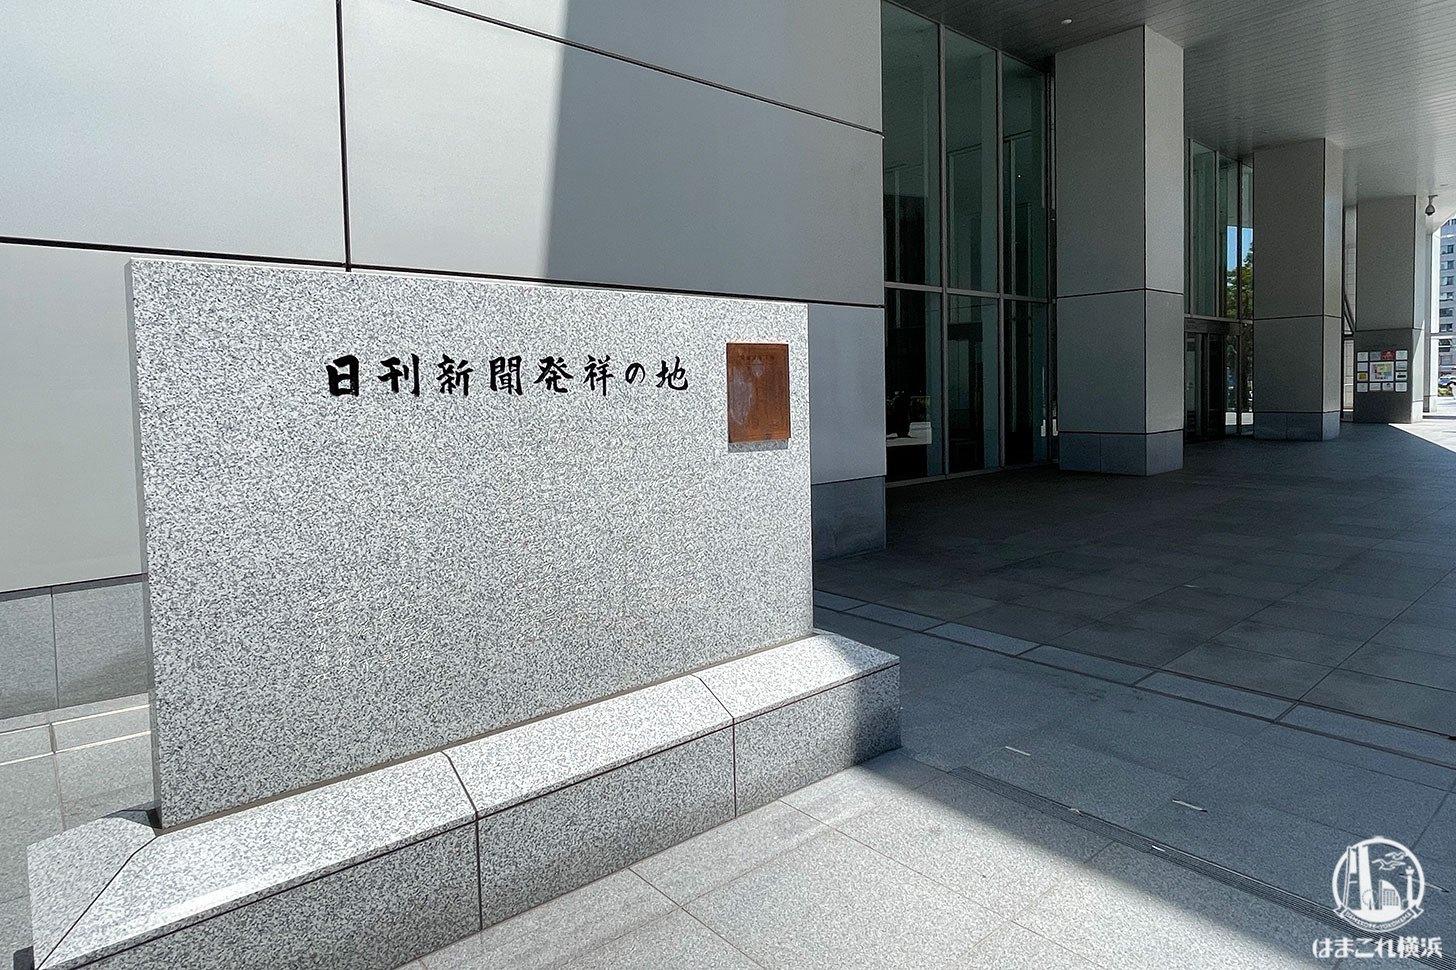 日刊新聞発祥の地 記念碑